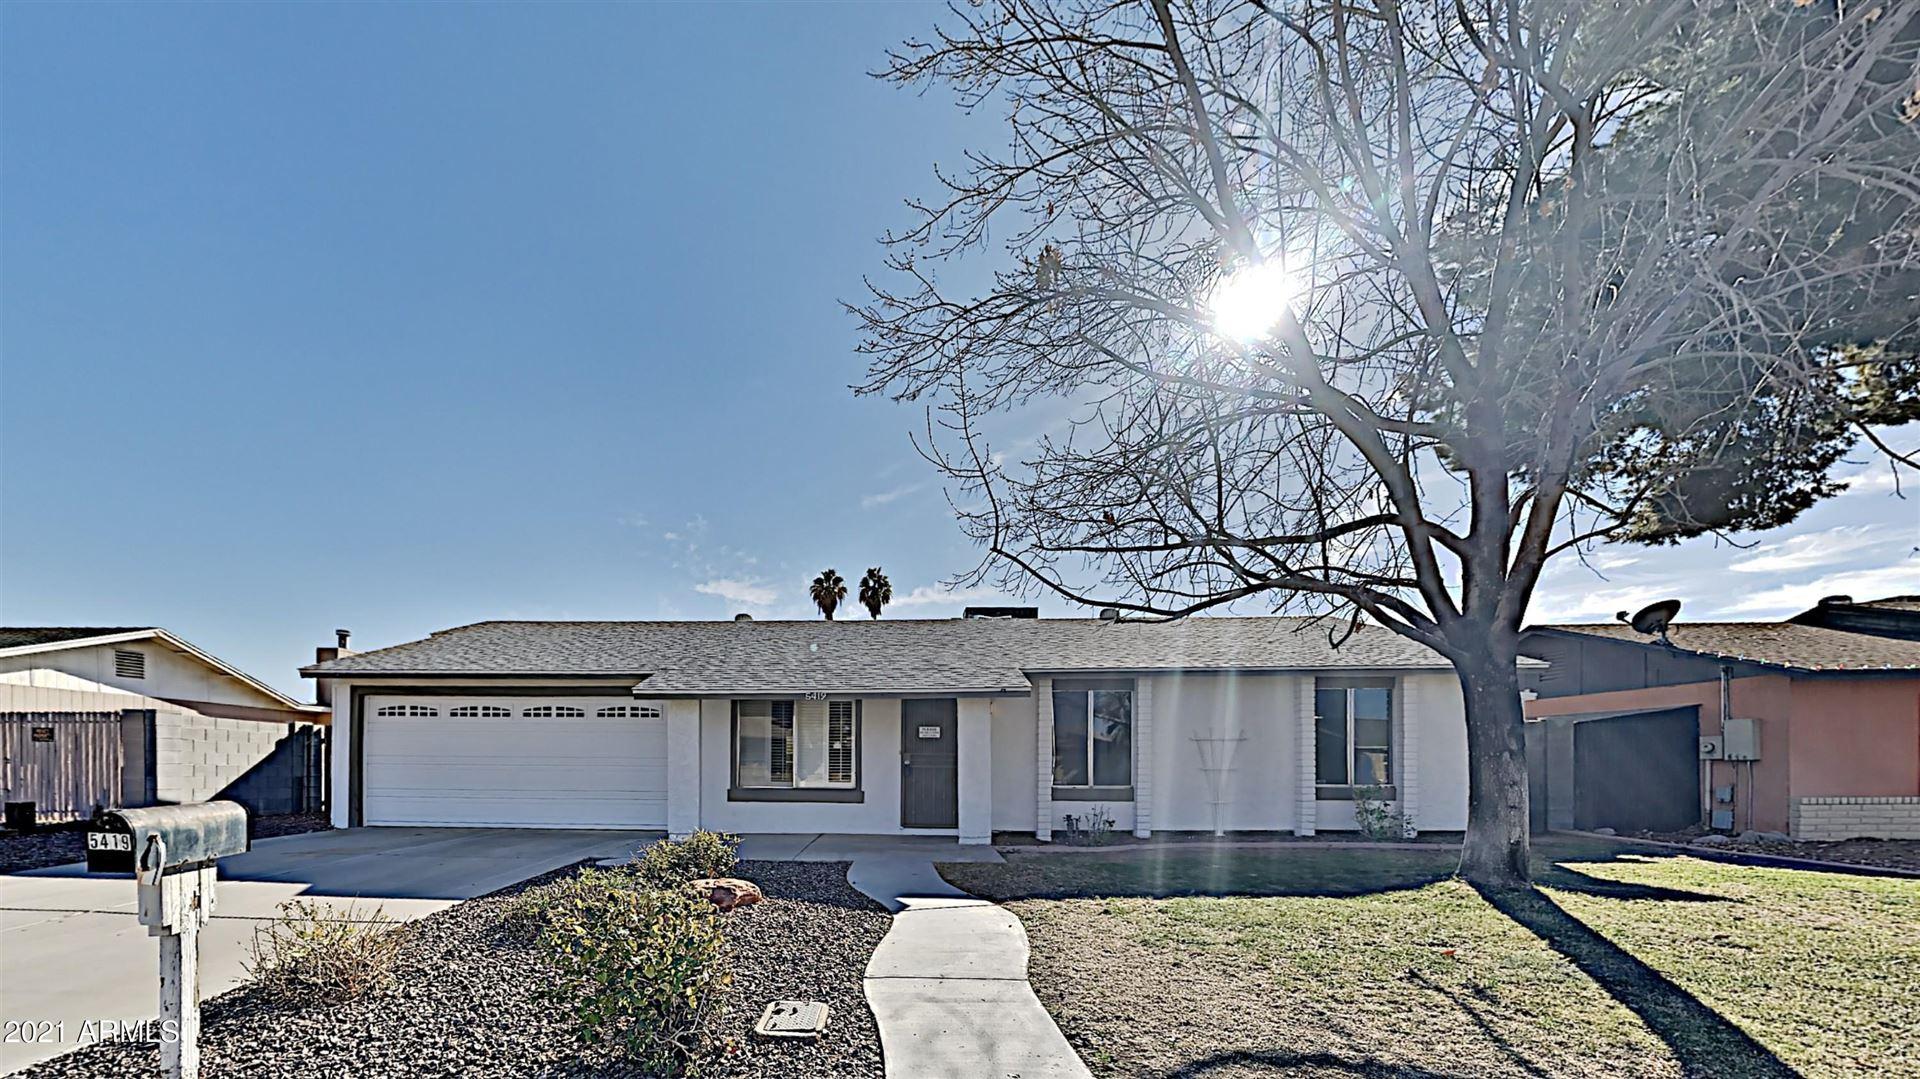 5419 W SUNNYSIDE Drive, Glendale, AZ 85304 - MLS#: 6177184